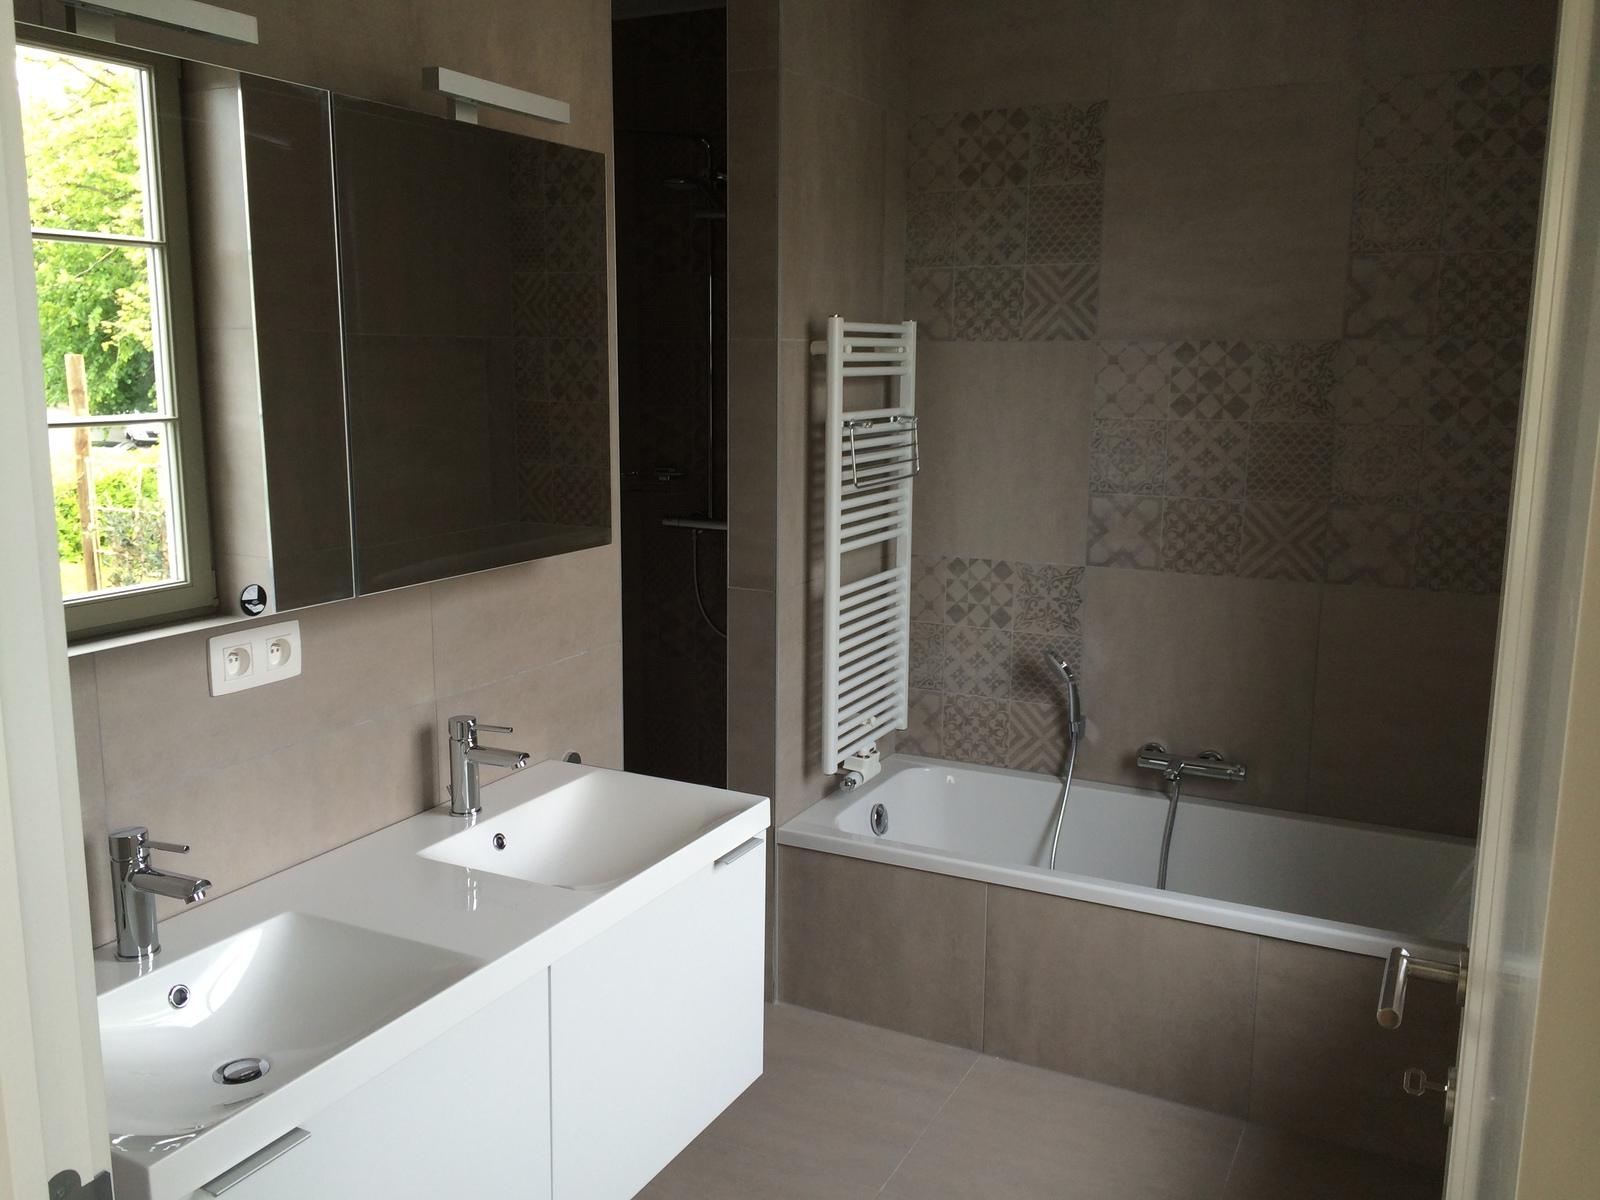 Sanitaire manhay bdh demoiti sp cialiste salle de bain for Sanitaire salle de bain